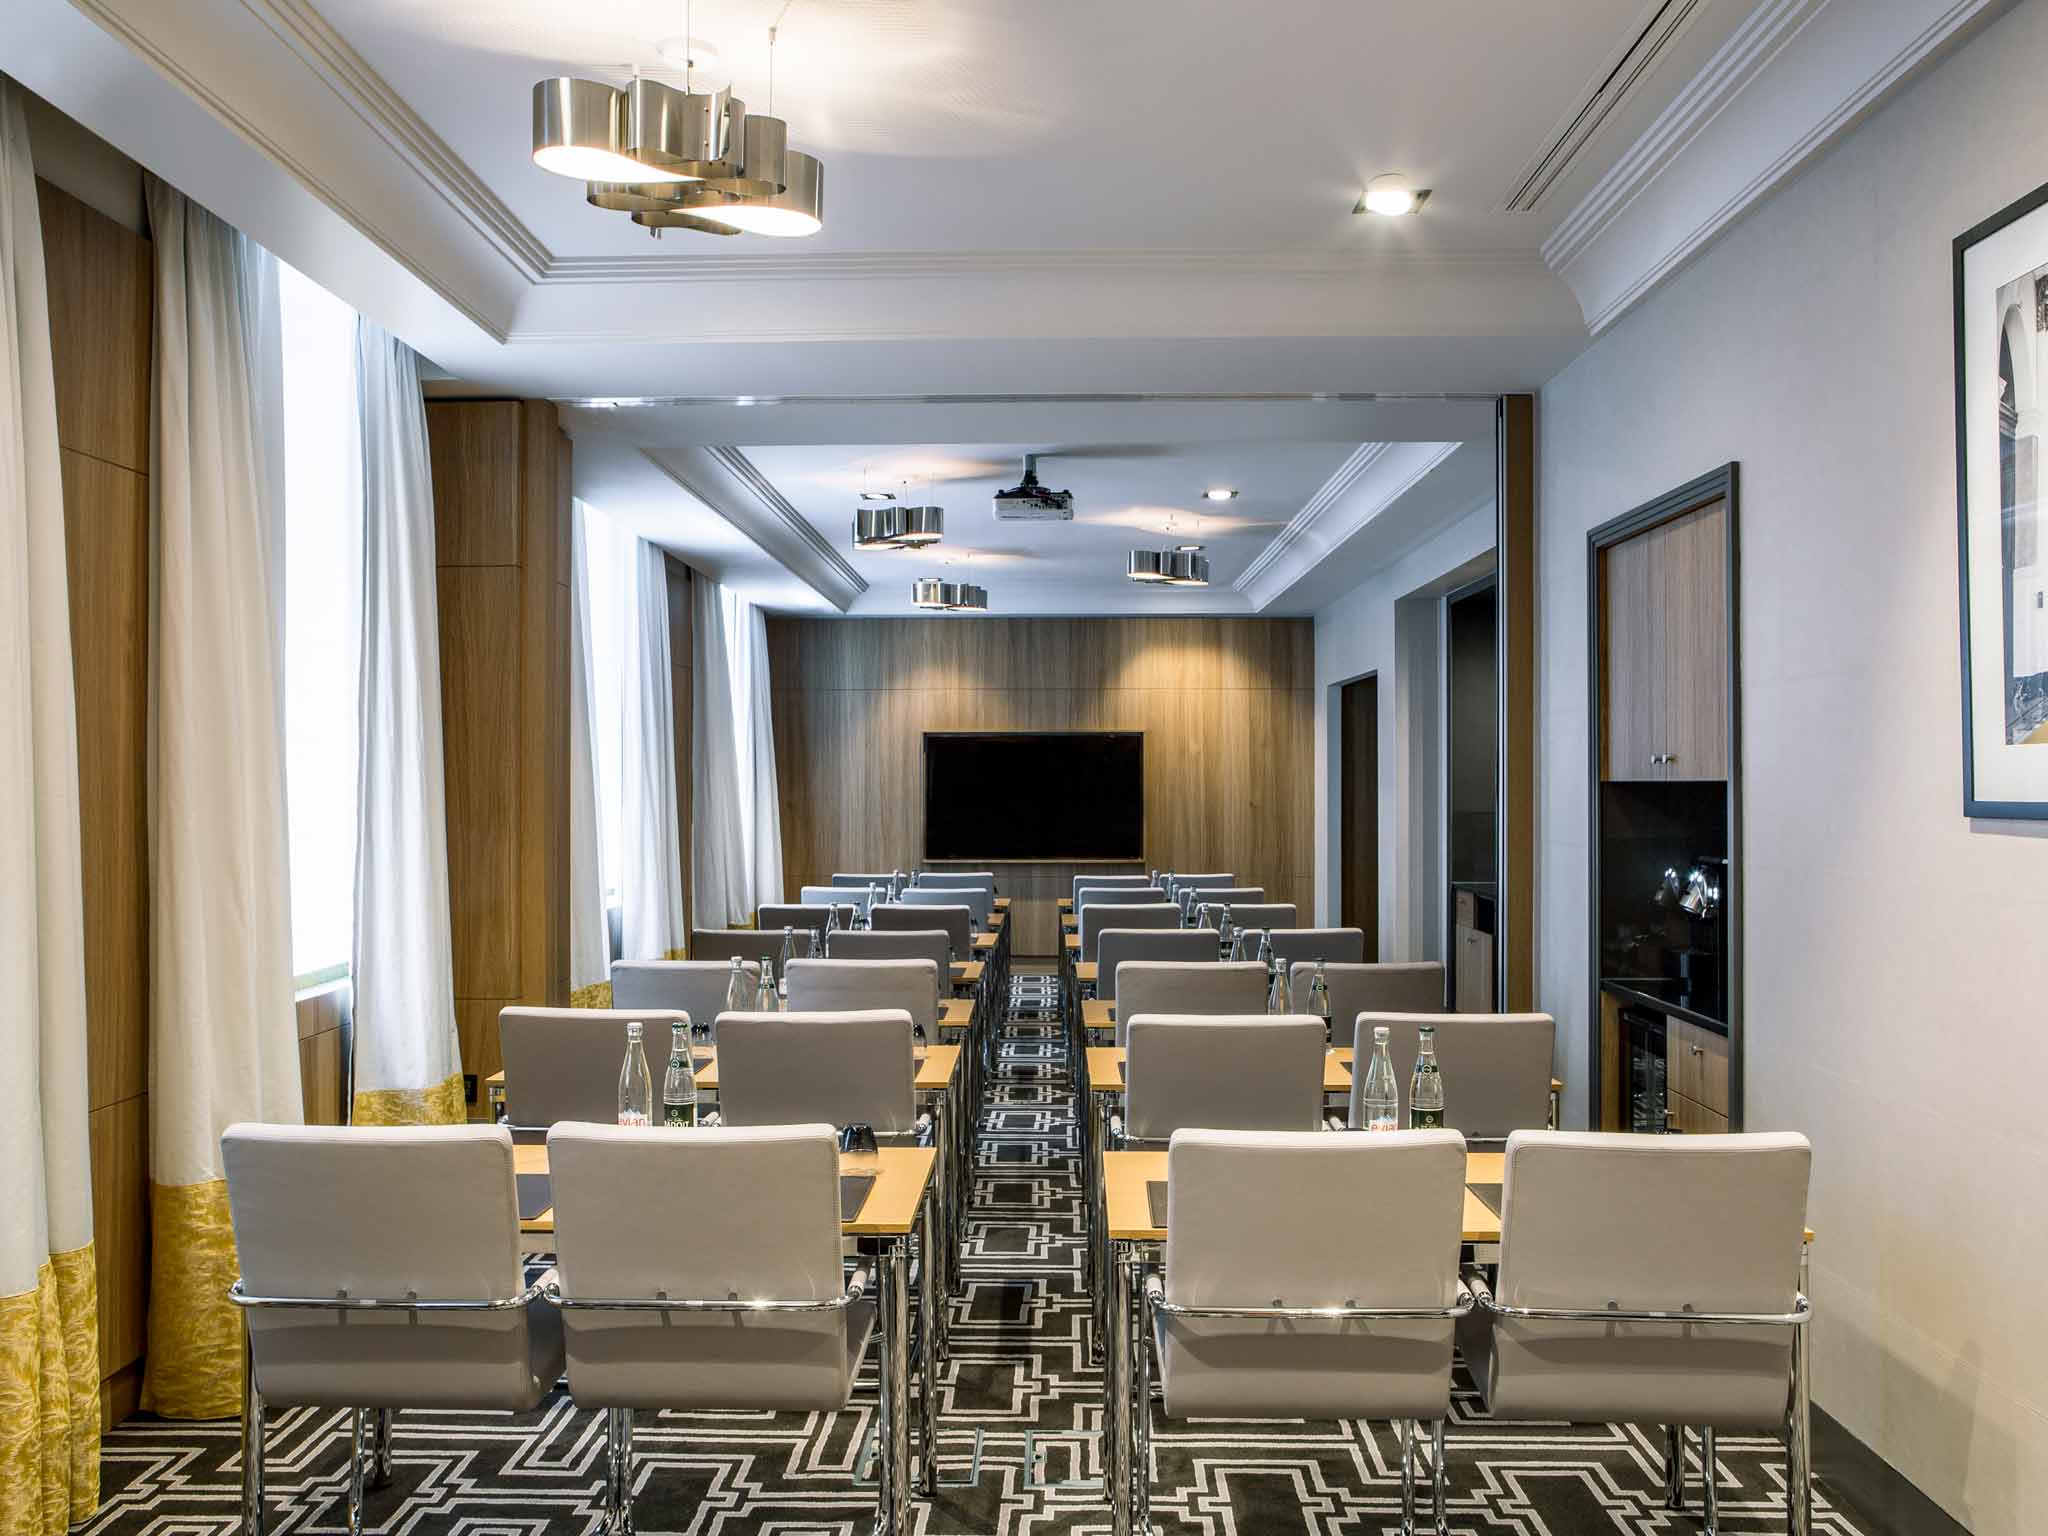 hotel sofitel le faubourg em paris desde 273 rumbo. Black Bedroom Furniture Sets. Home Design Ideas